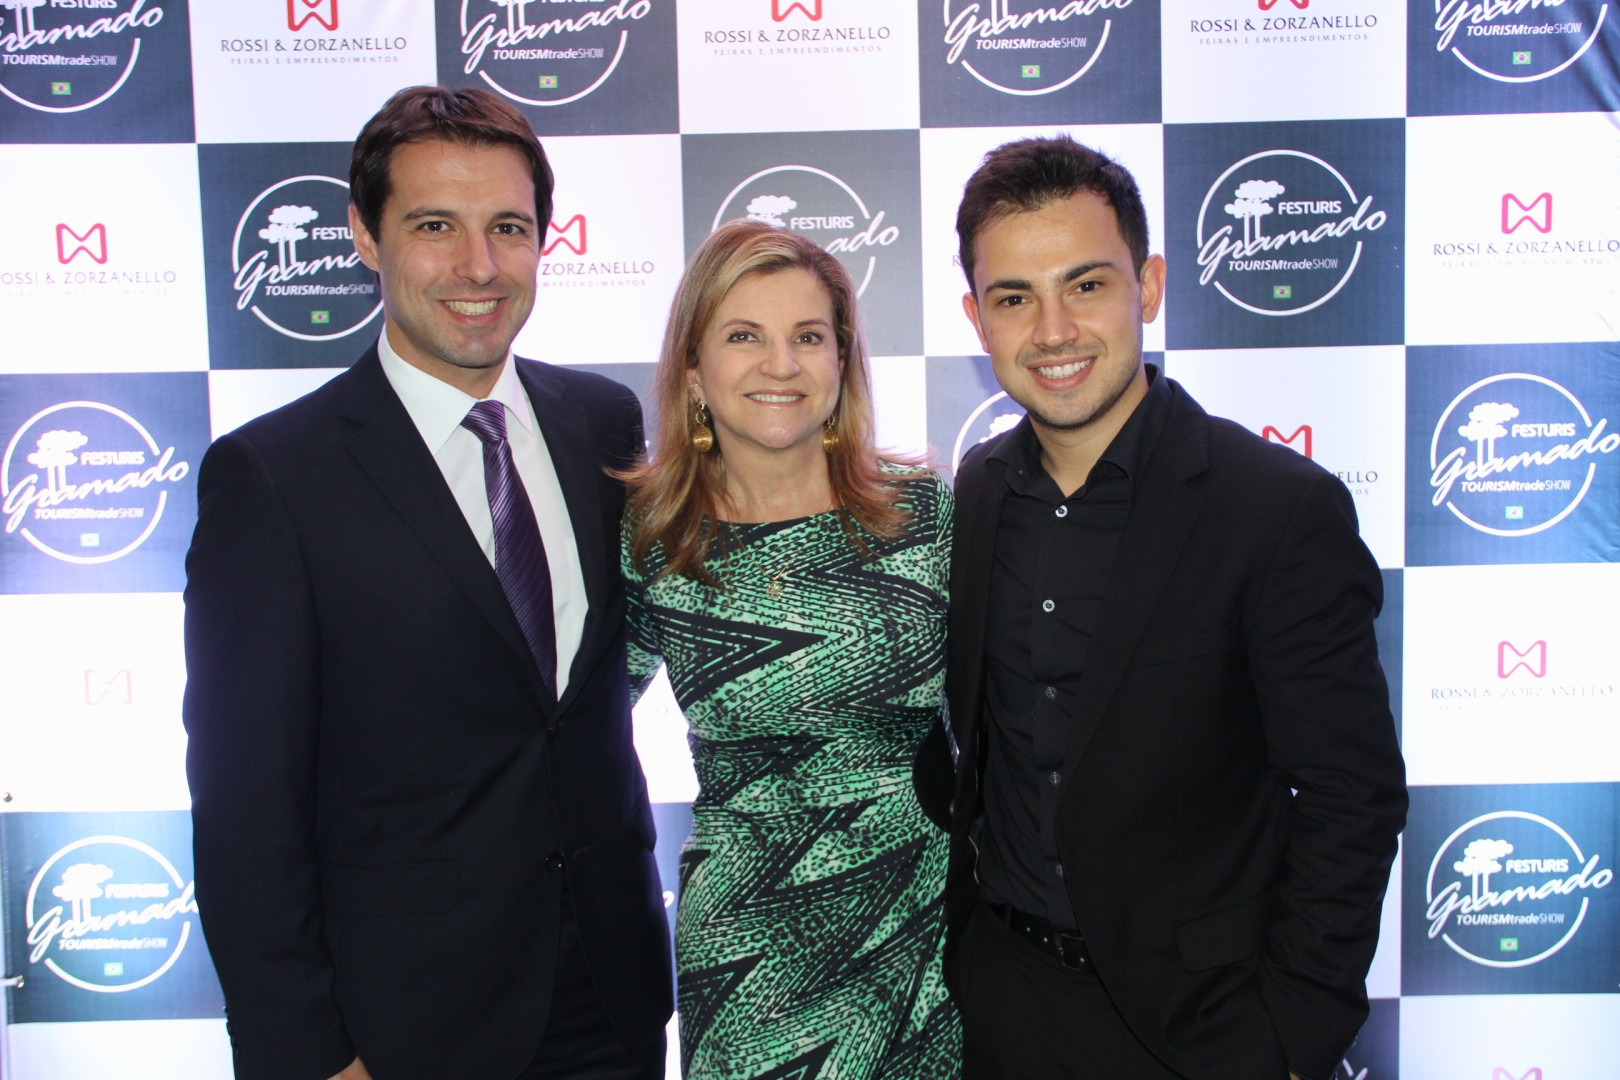 Diretores da feira - Eduardo Zorzanello, Marta Rossi e Marcus Vinicius Rossi